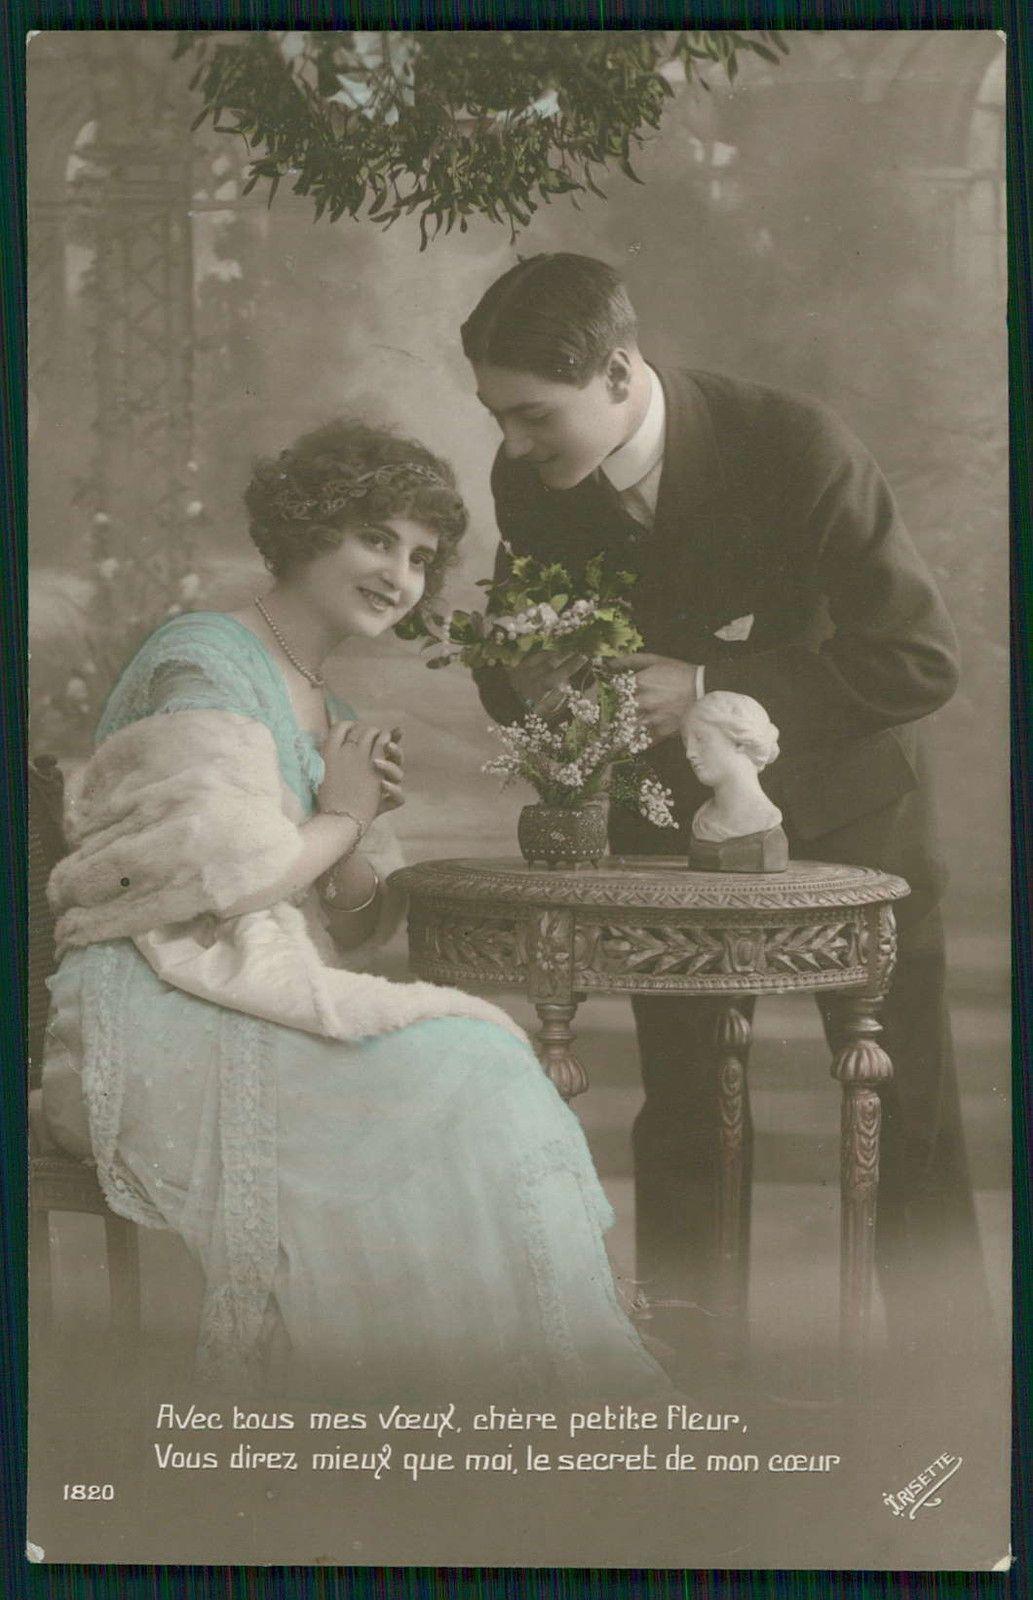 Edwardian Lady Love Romance Couple flirt original vintage